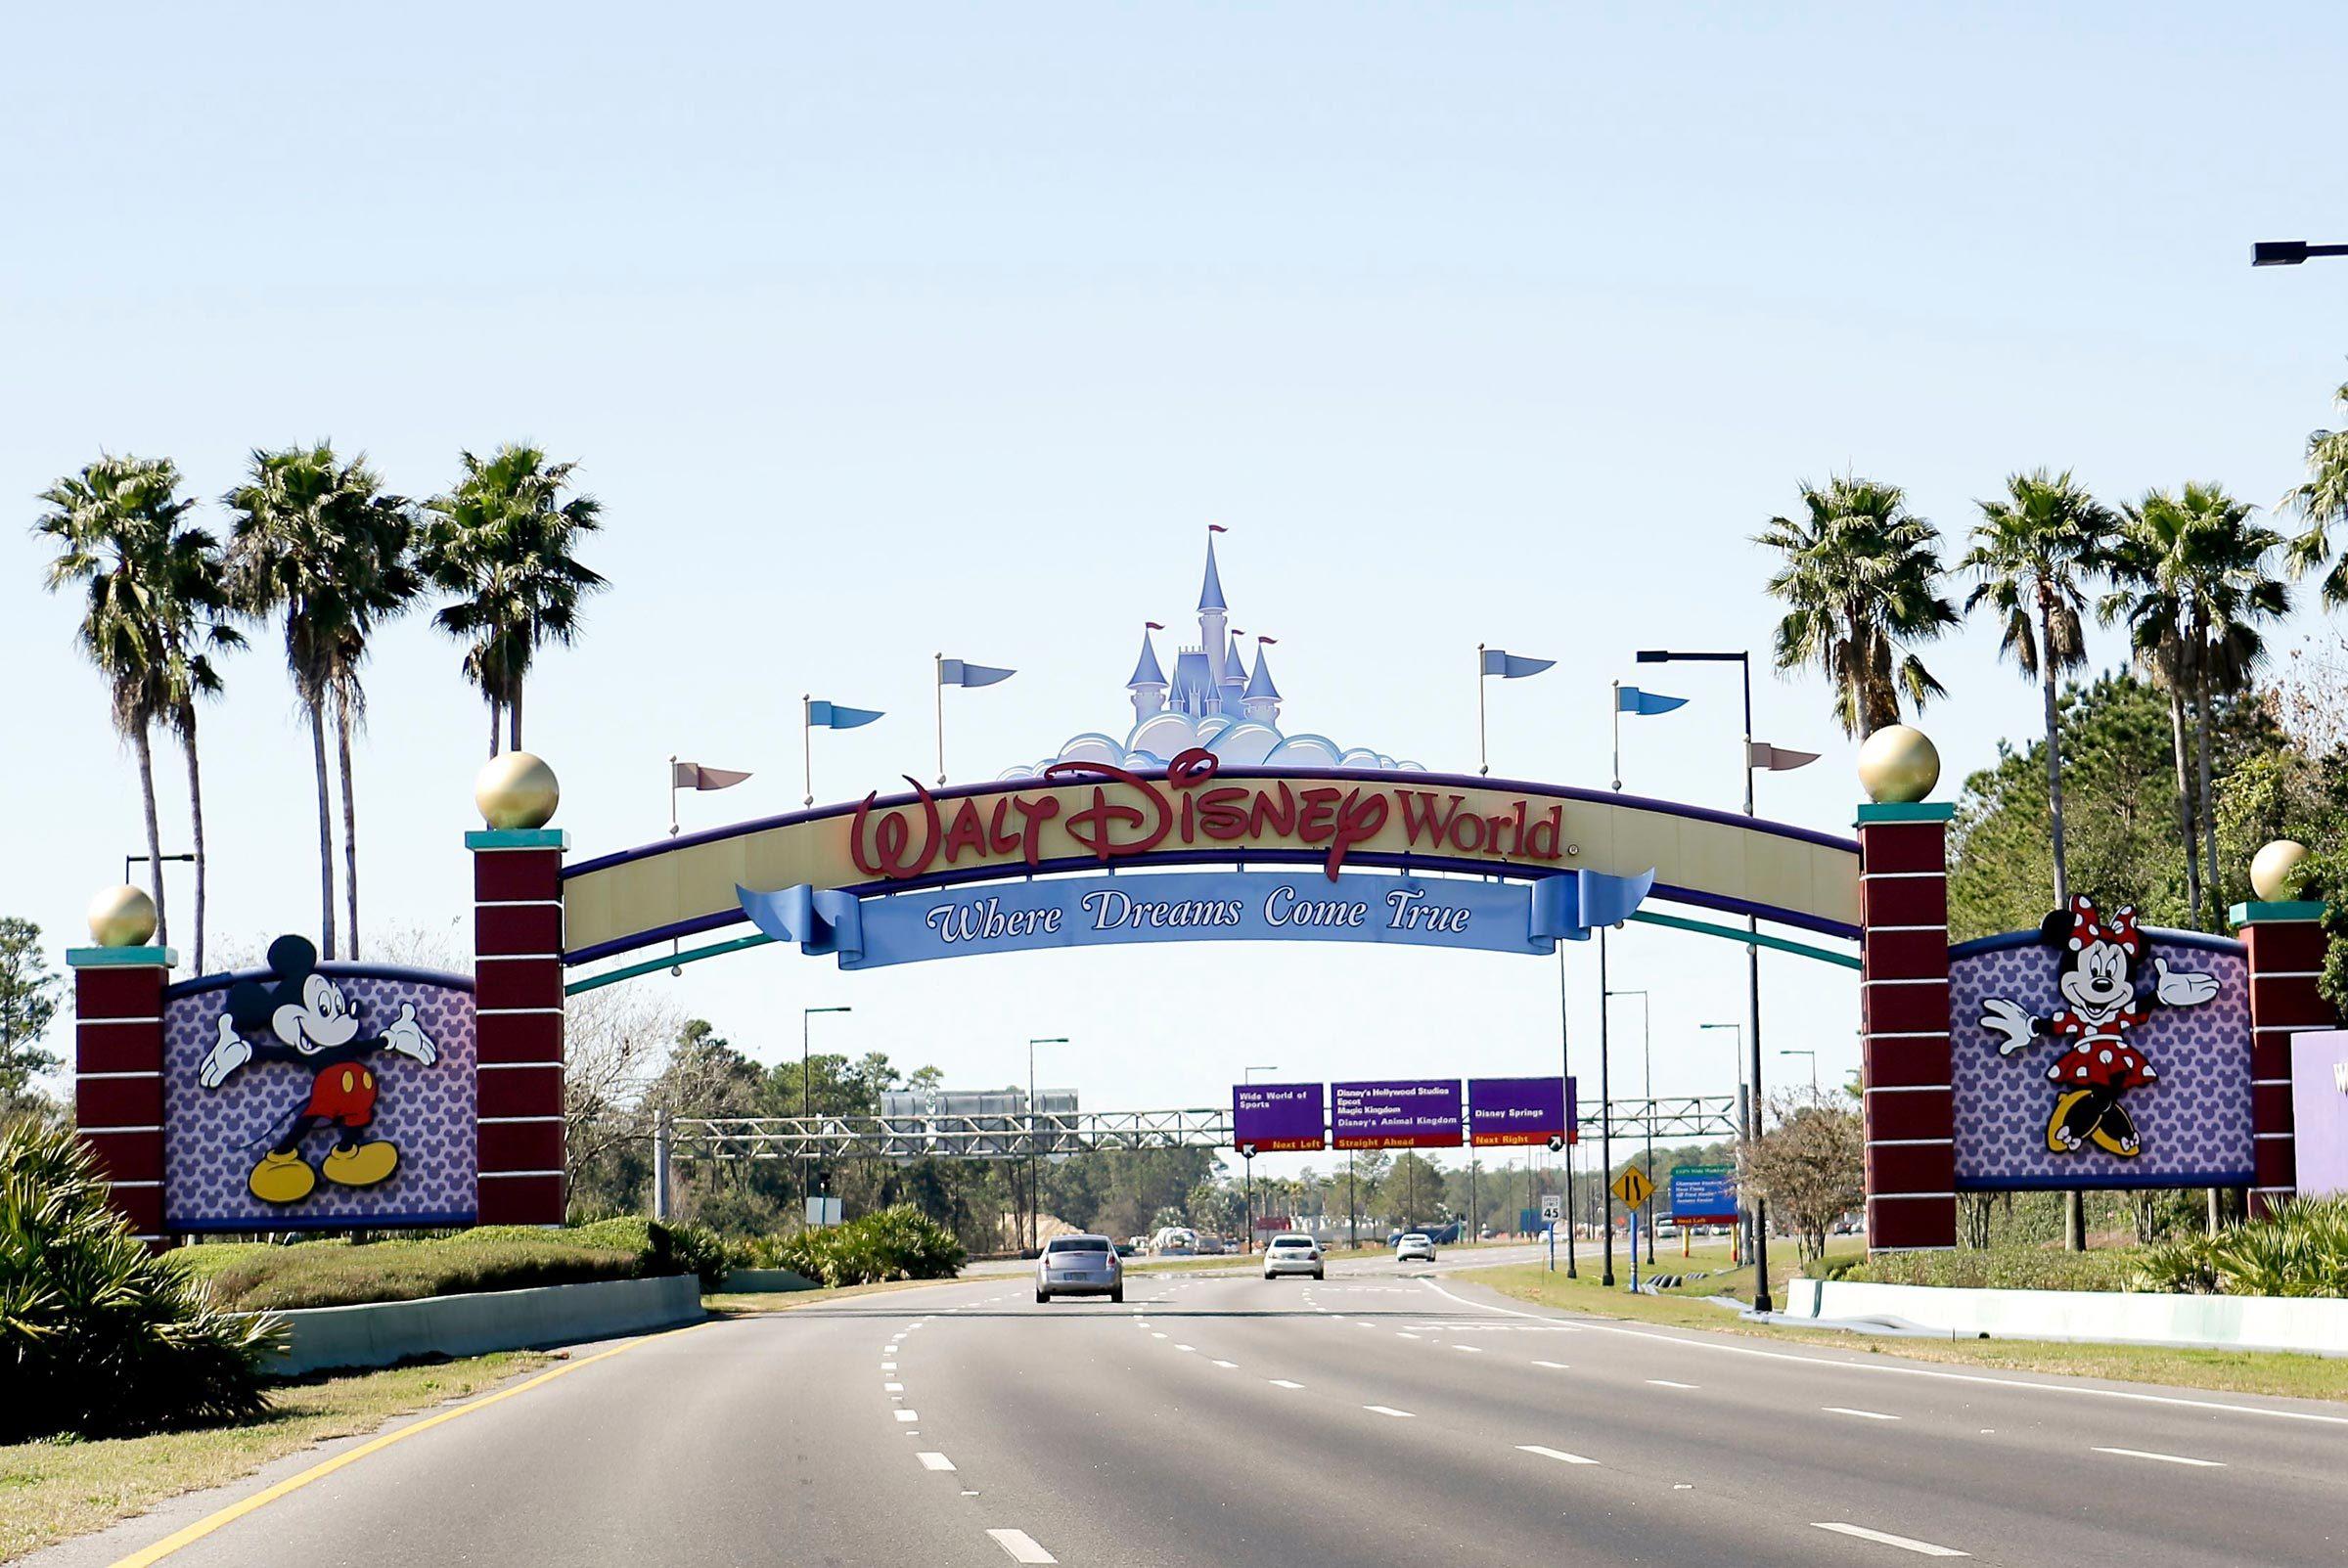 Theme Parks Tax Wars, Lake Buena Vista, USA - 31 Jan 2017